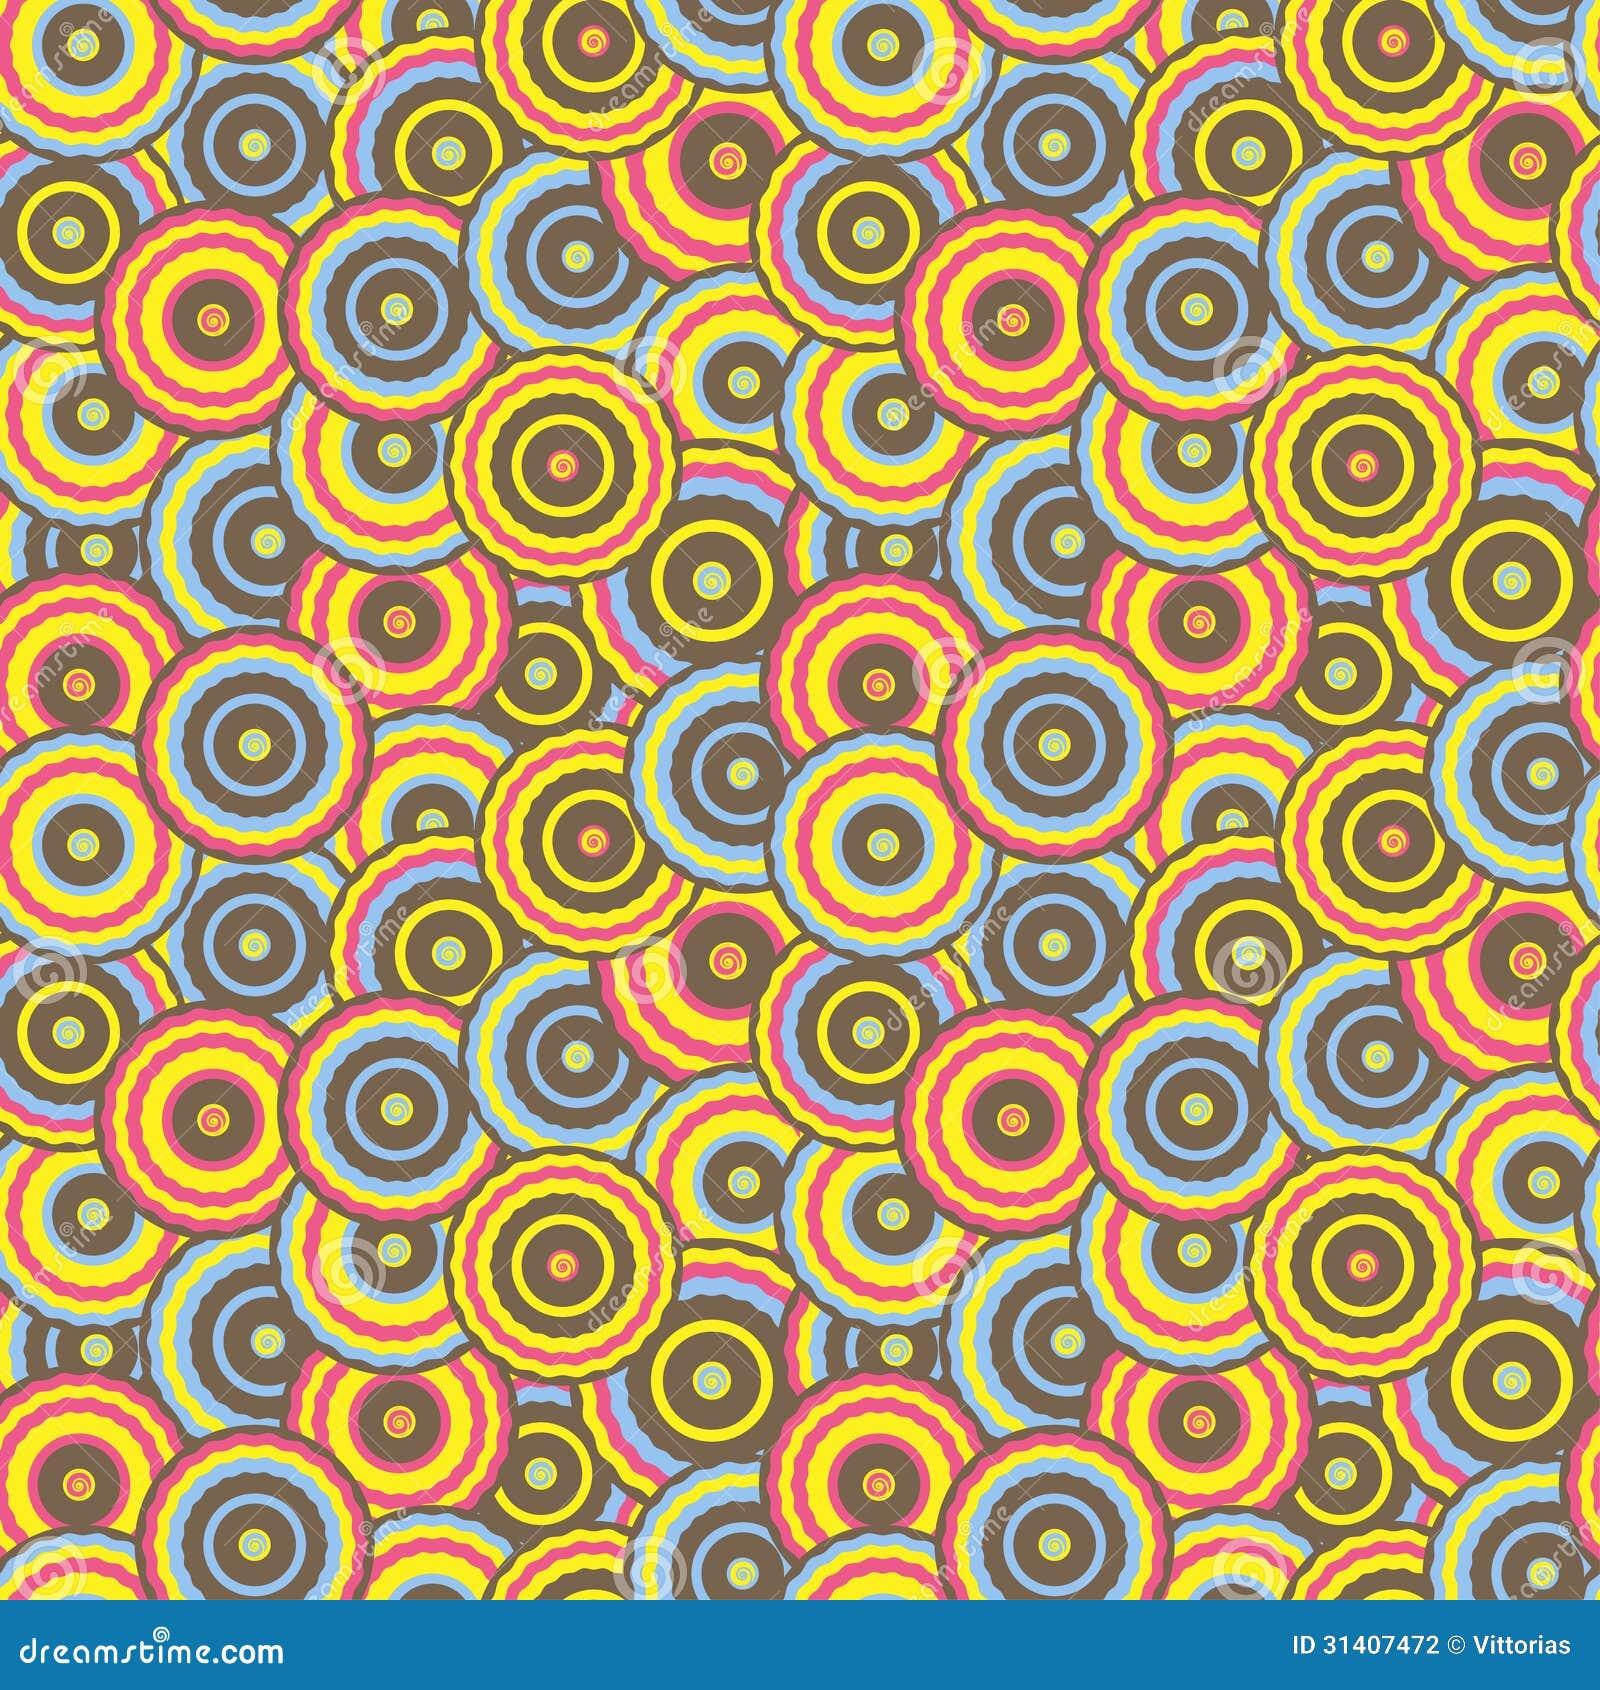 How to design scrapbook using colored paper - Colorful Decorative Design Fabric Paper Pattern Retro Scrapbook